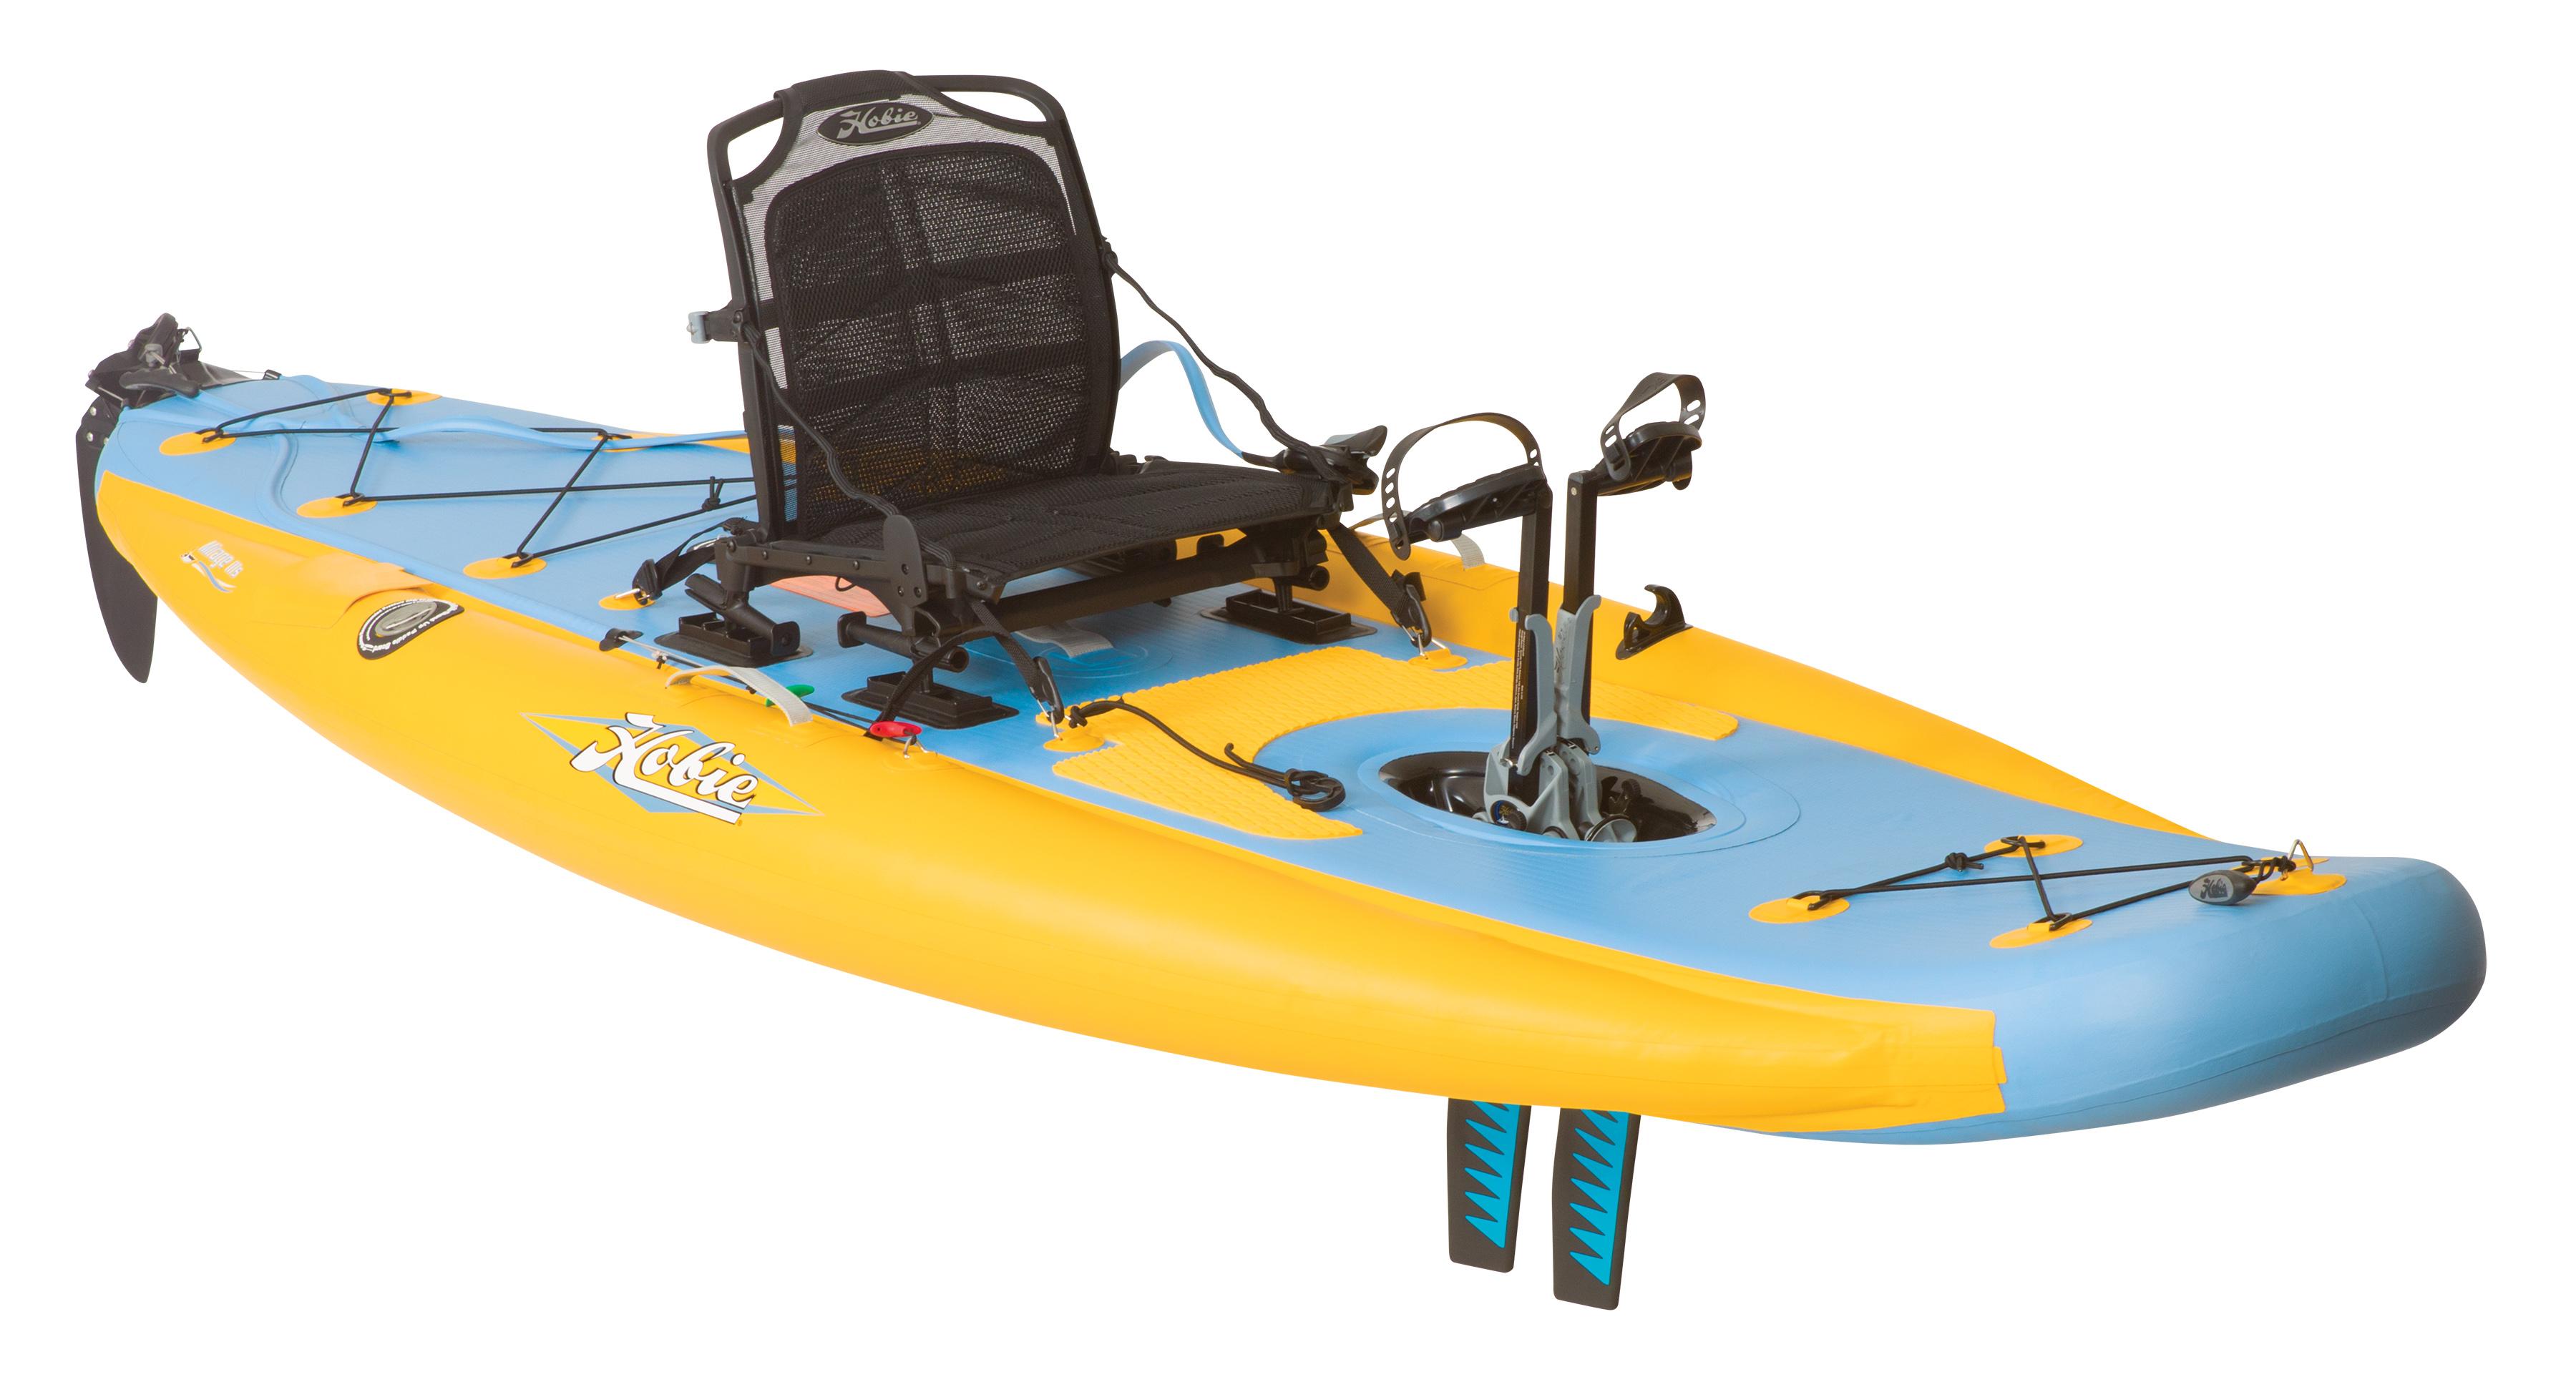 Hobie Mirage Inflatable Tandem Kayak I14t Review